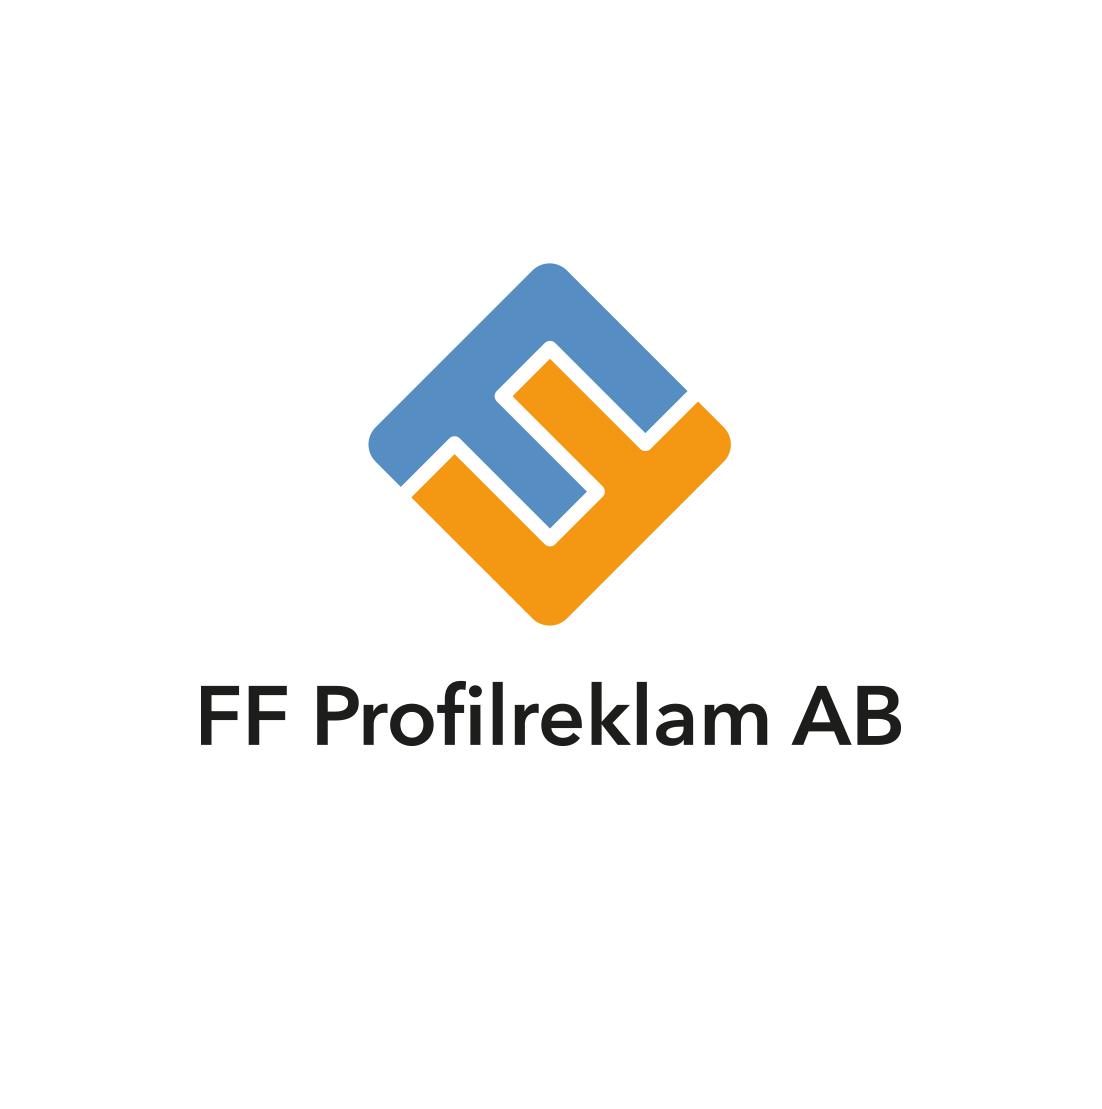 FF-profilreklam